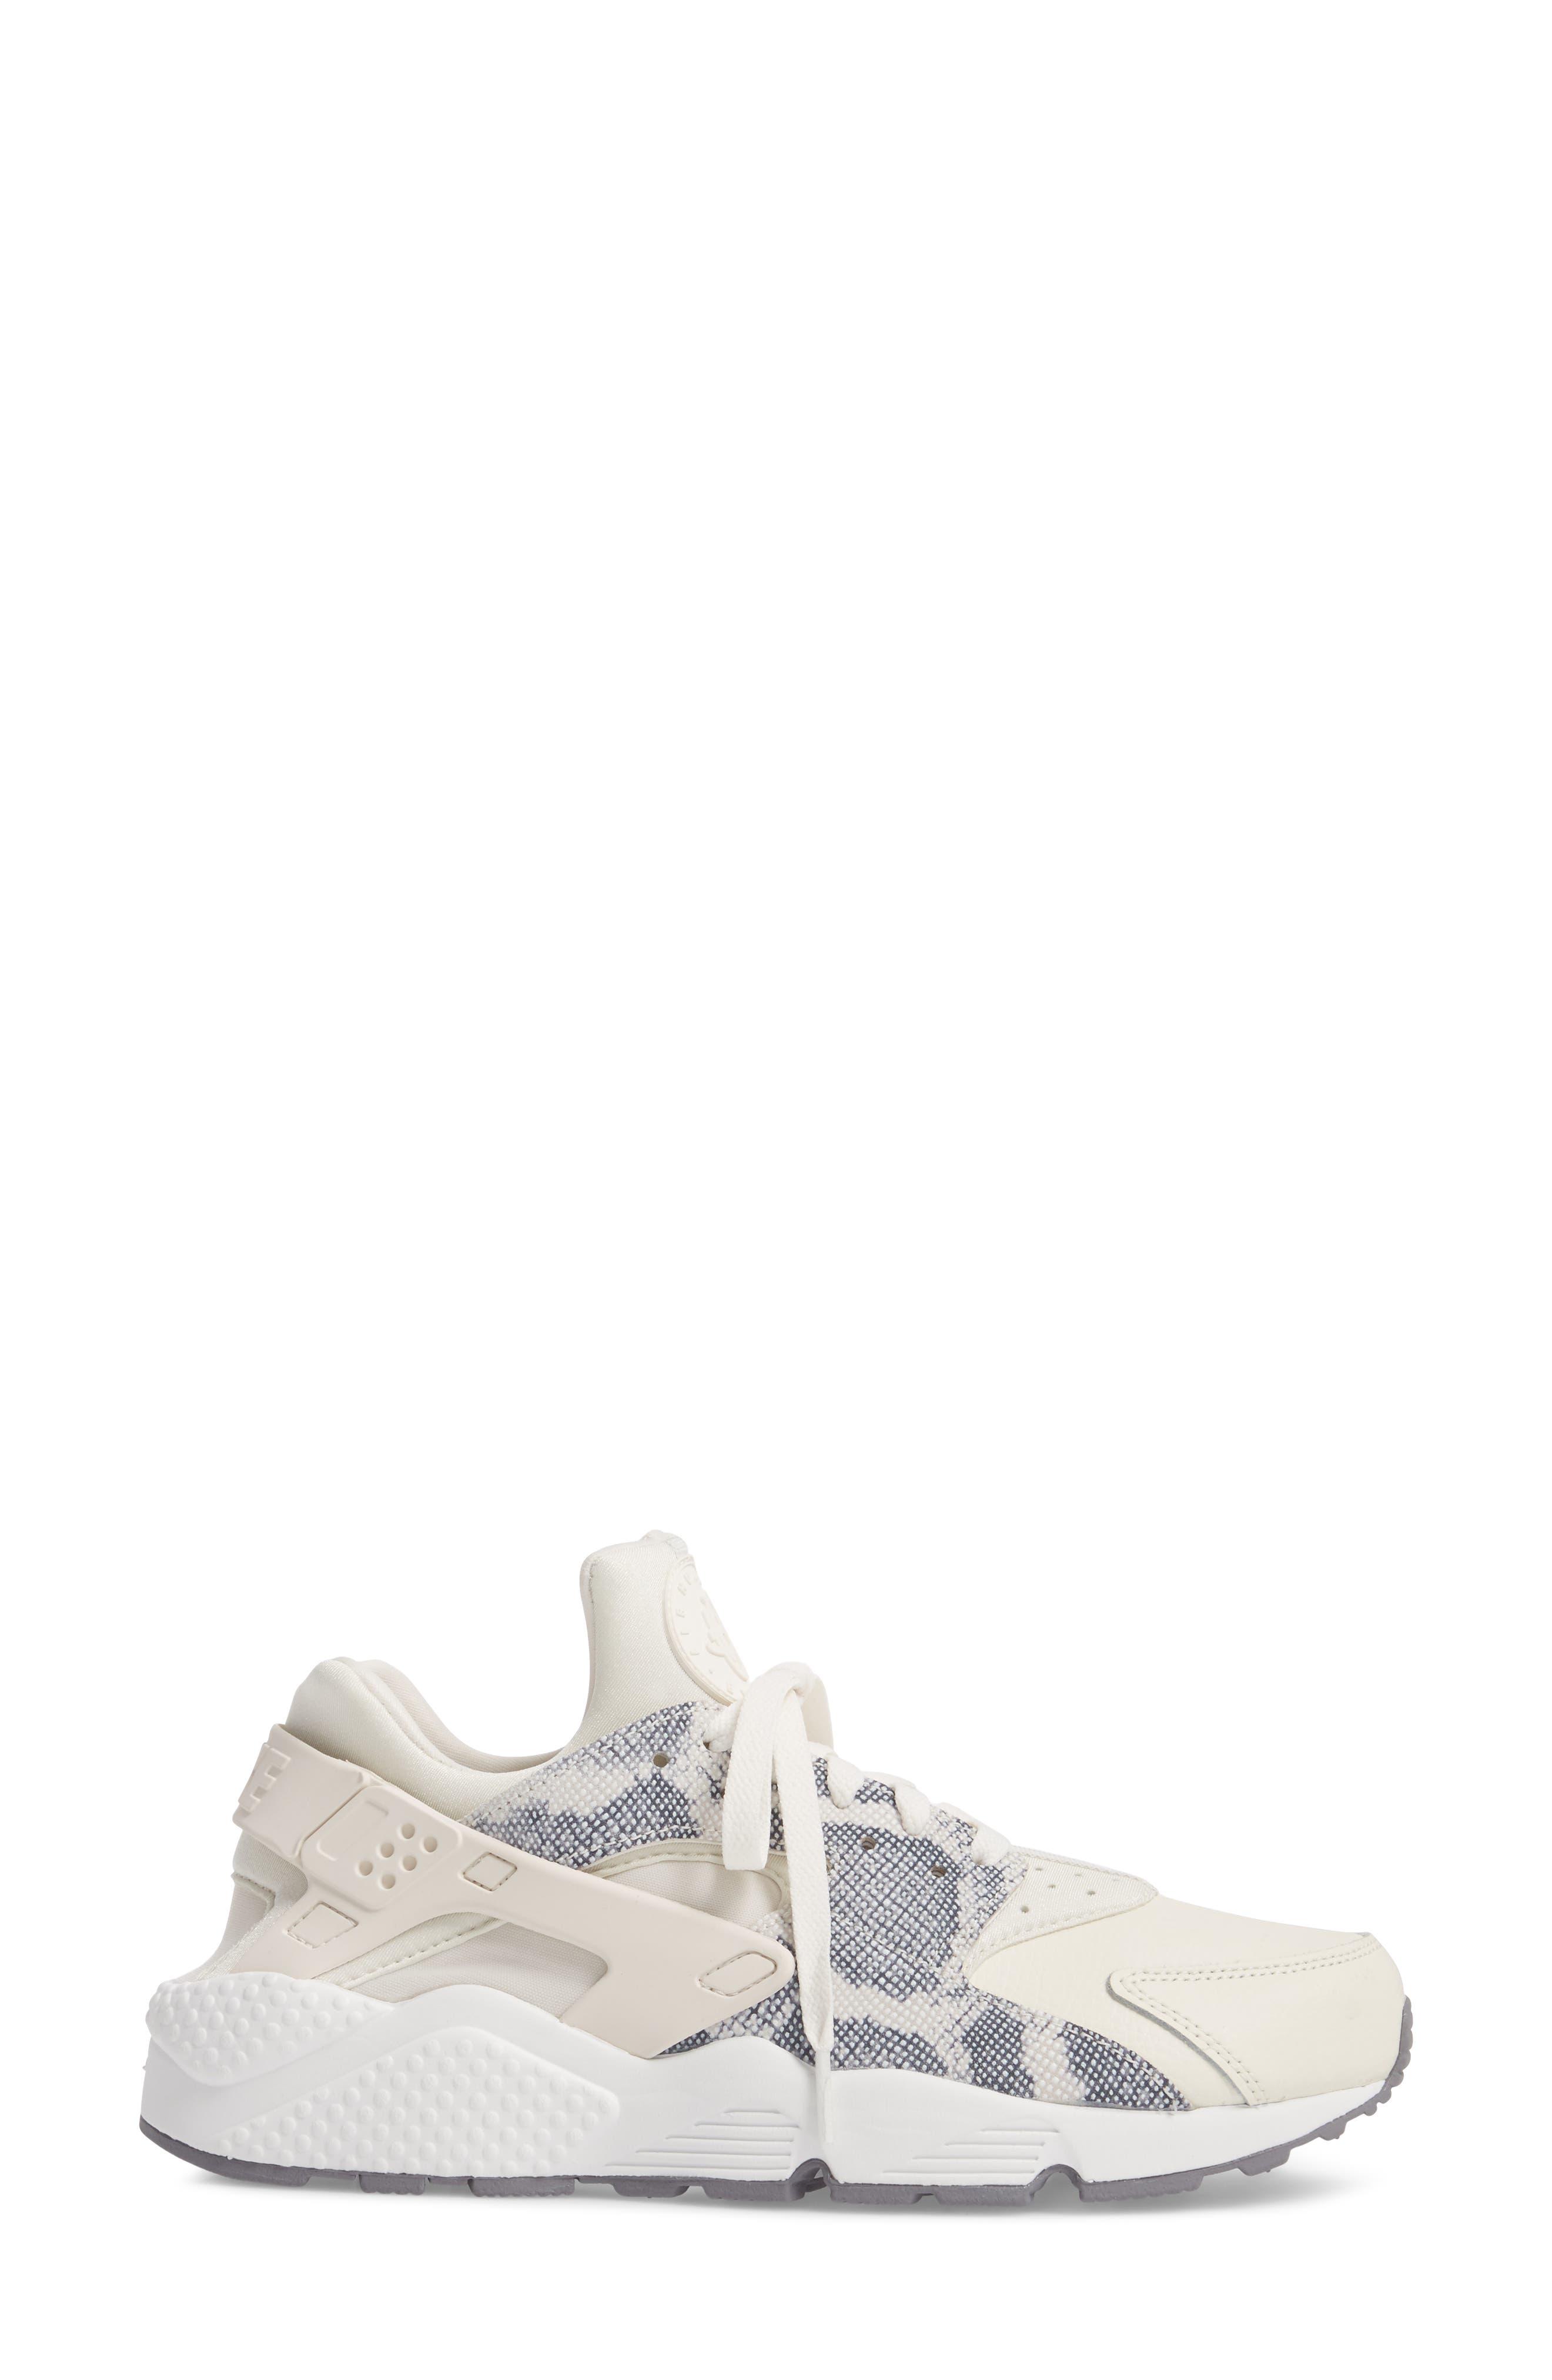 'Air Huarache' Sneaker,                             Alternate thumbnail 3, color,                             255